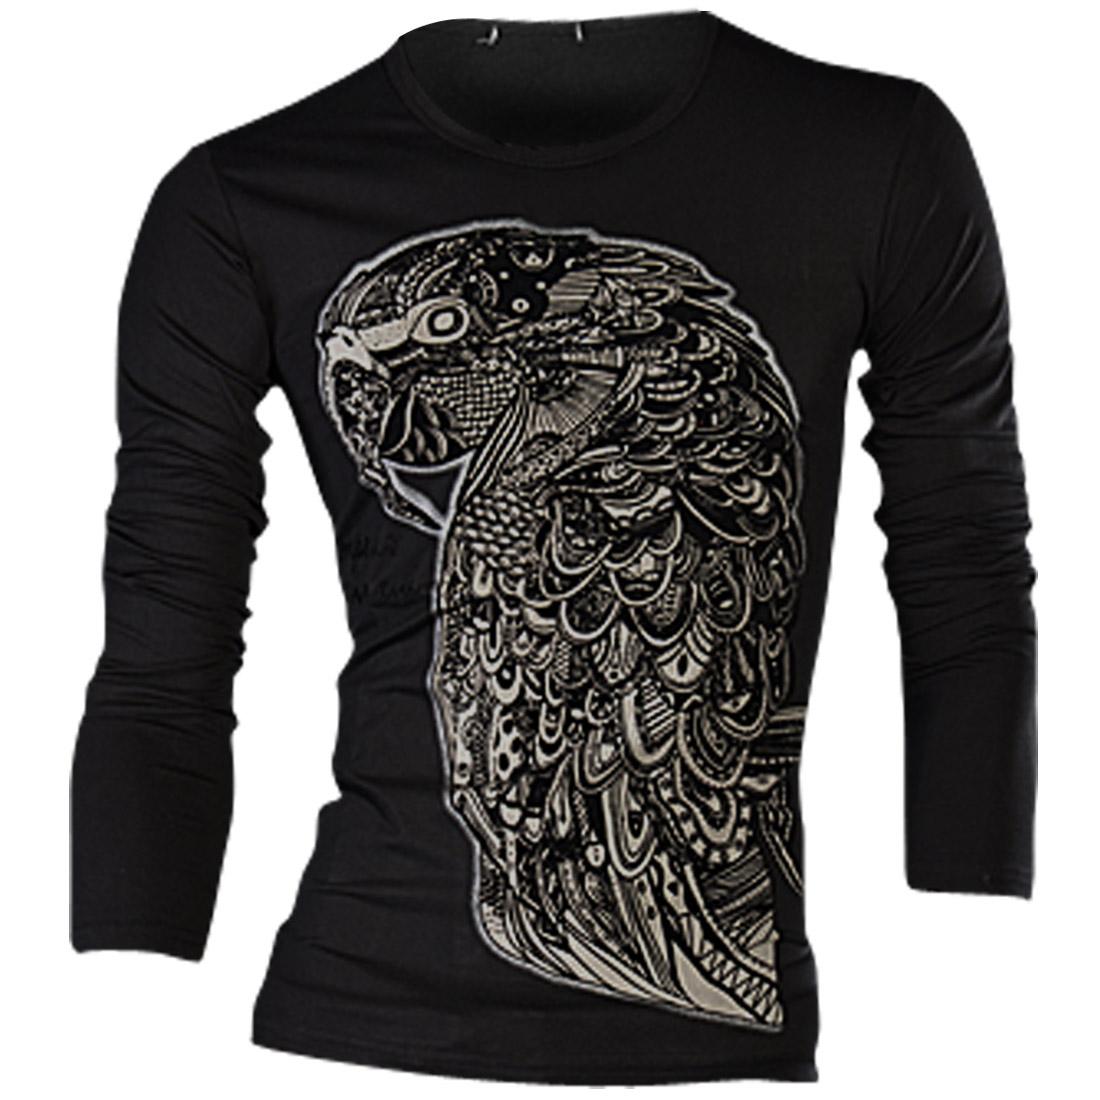 Men Long Sleeved Parrot Print Fashion Slim Black Top Shirt S